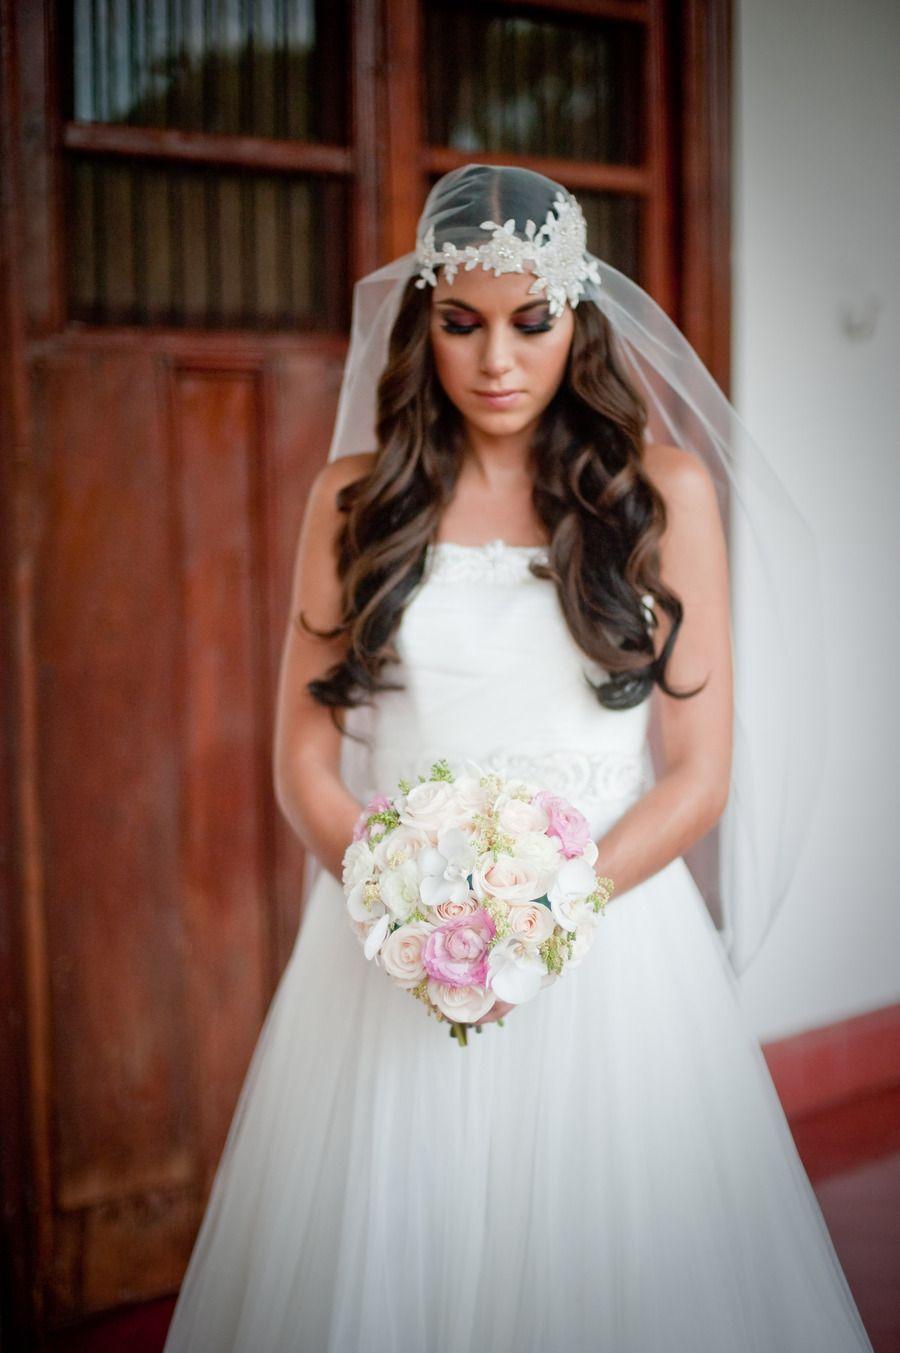 Photography: Life Wonders Photography - Dorota Jamal - lifewondersphotography.com/   Read More on SMP: http://www.stylemepretty.com/destination-weddings/2013/12/04/mexican-hacienda-wedding-inspiration-from-life-wonders-photography/